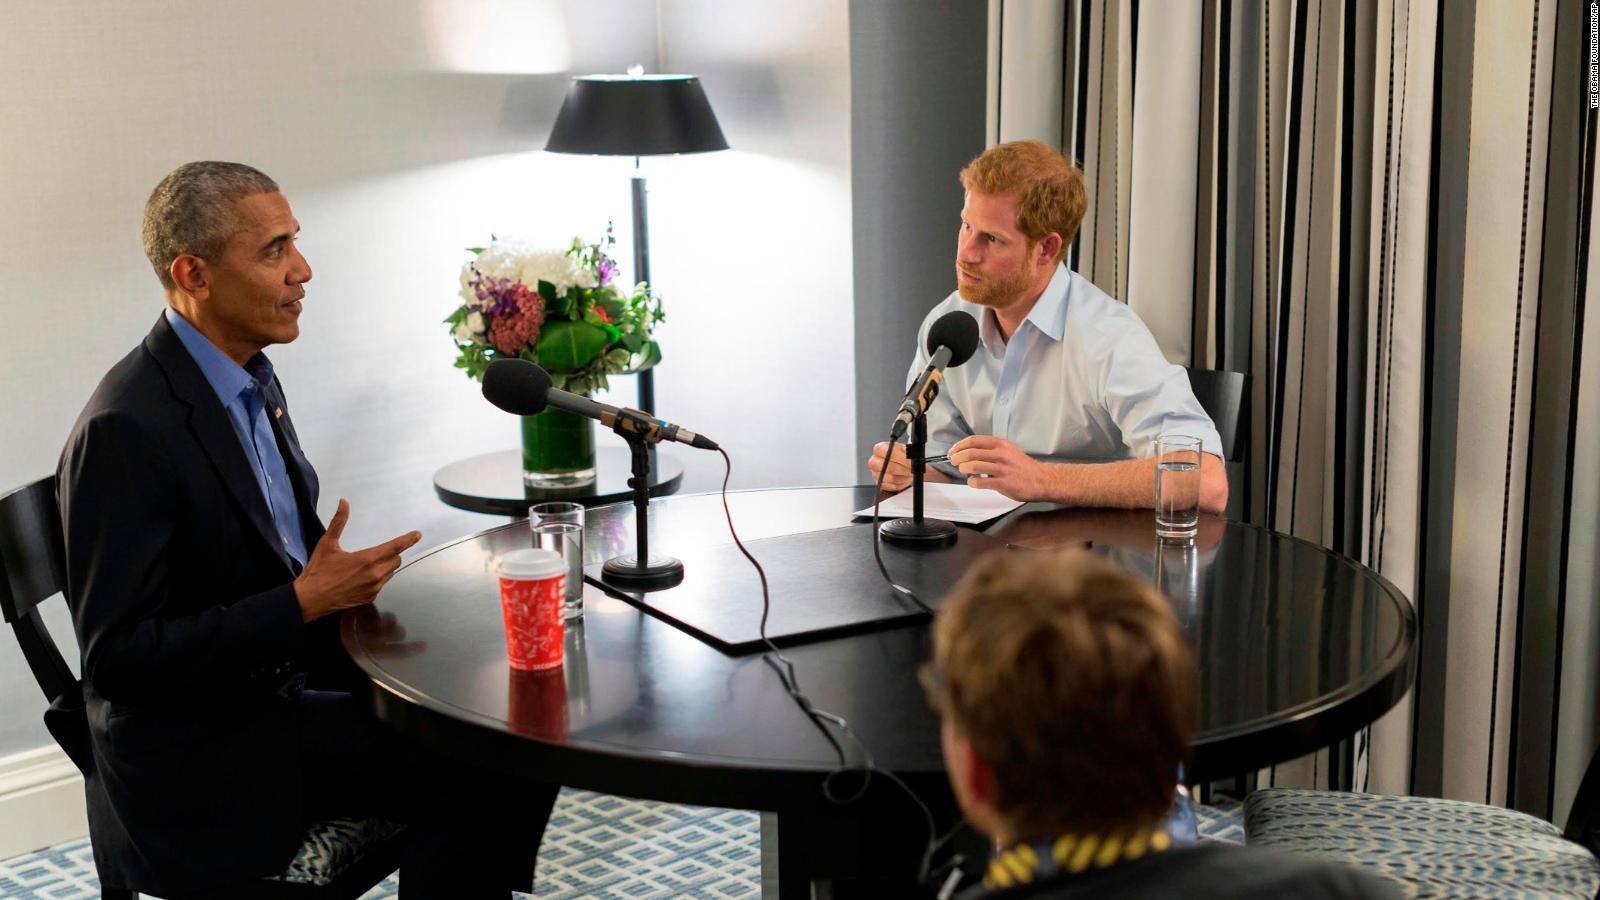 hight resolution of interviews